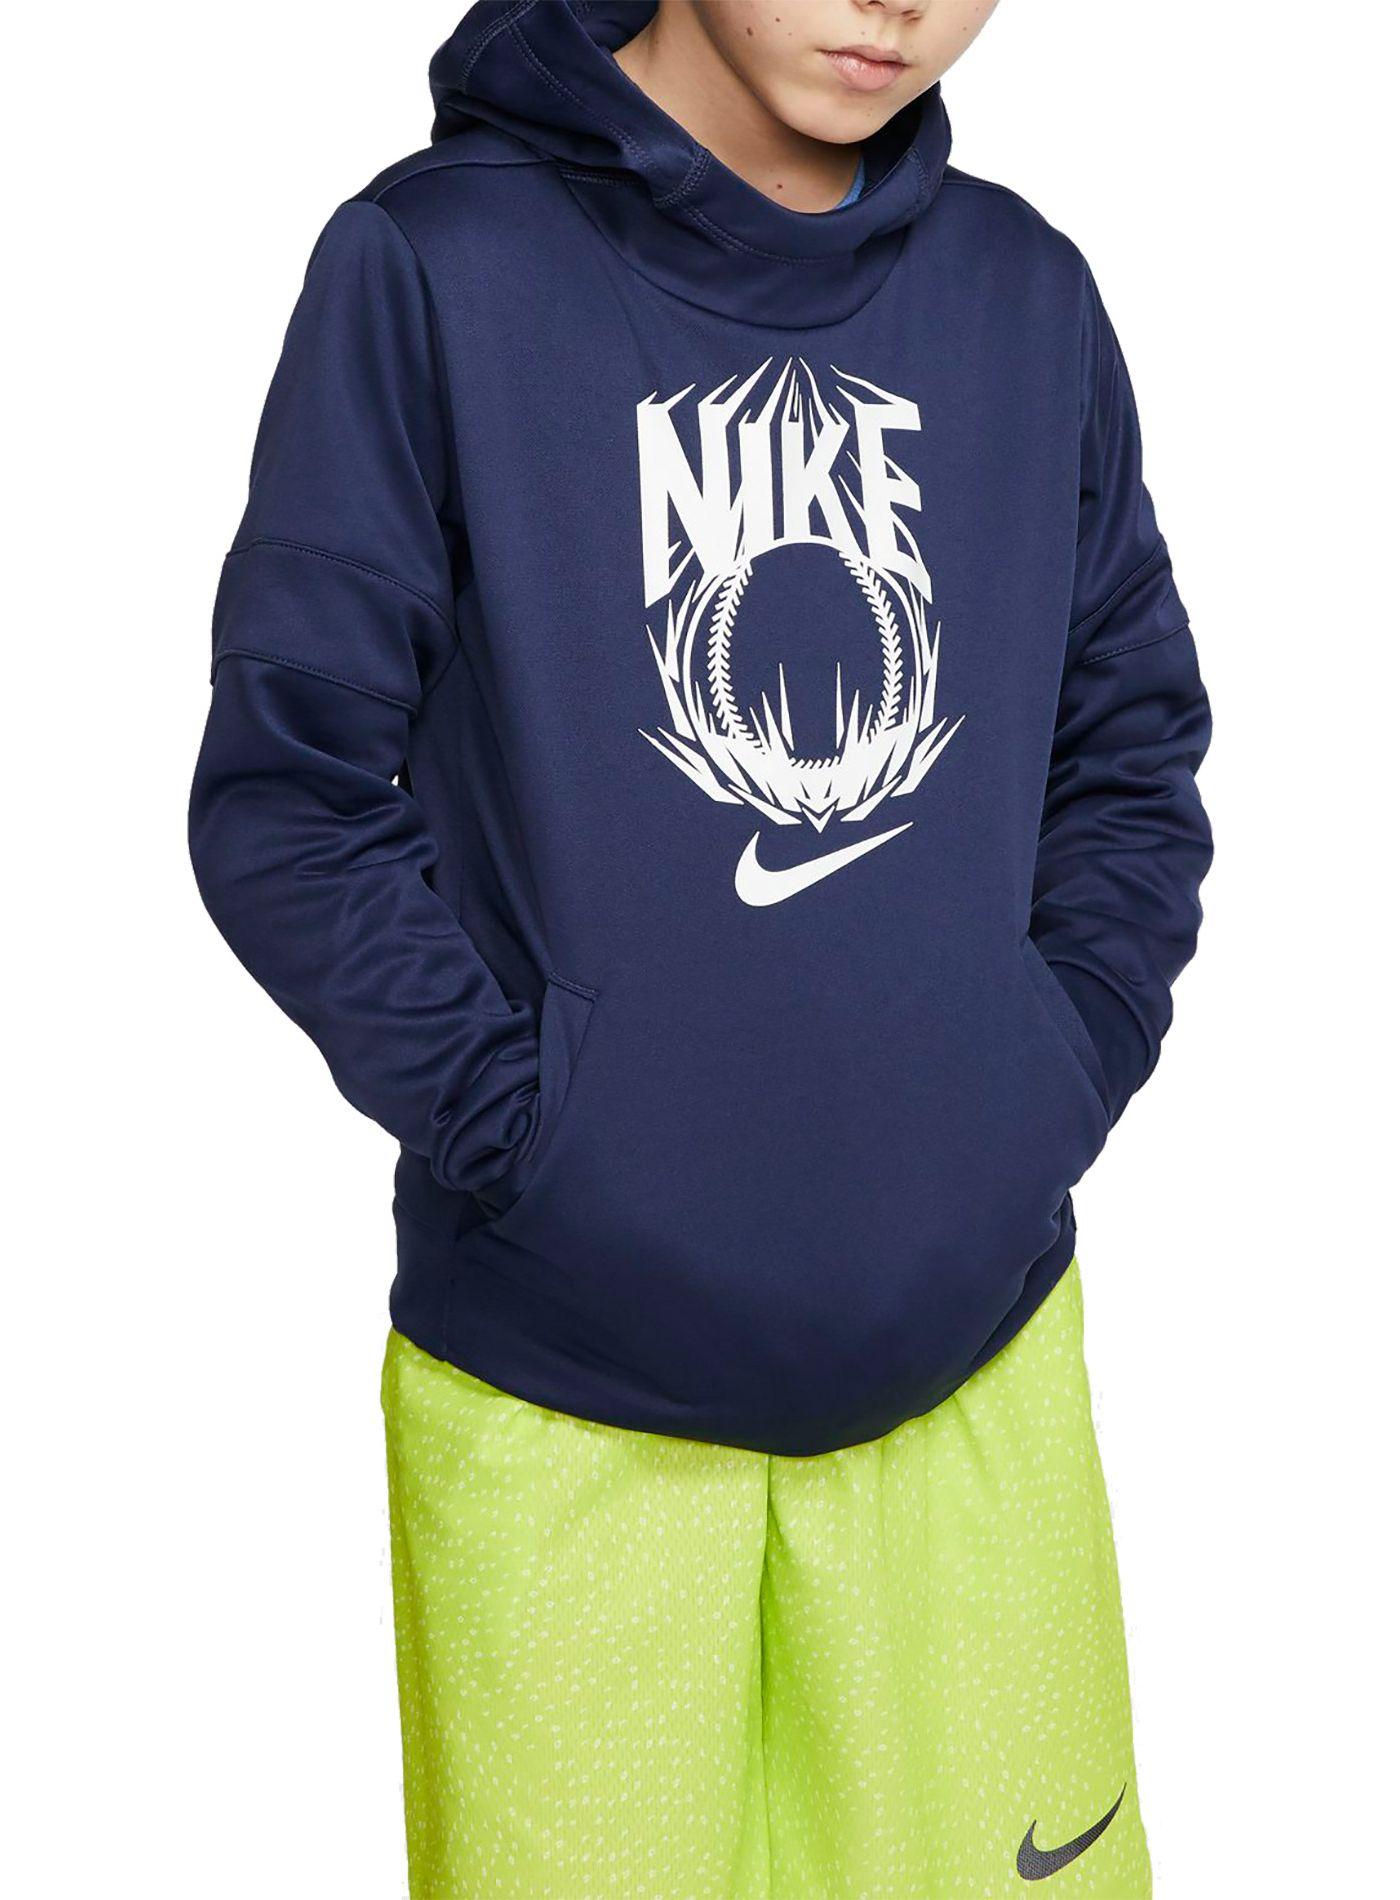 Nike Boys' Therma Pullover Baseball Hoodie